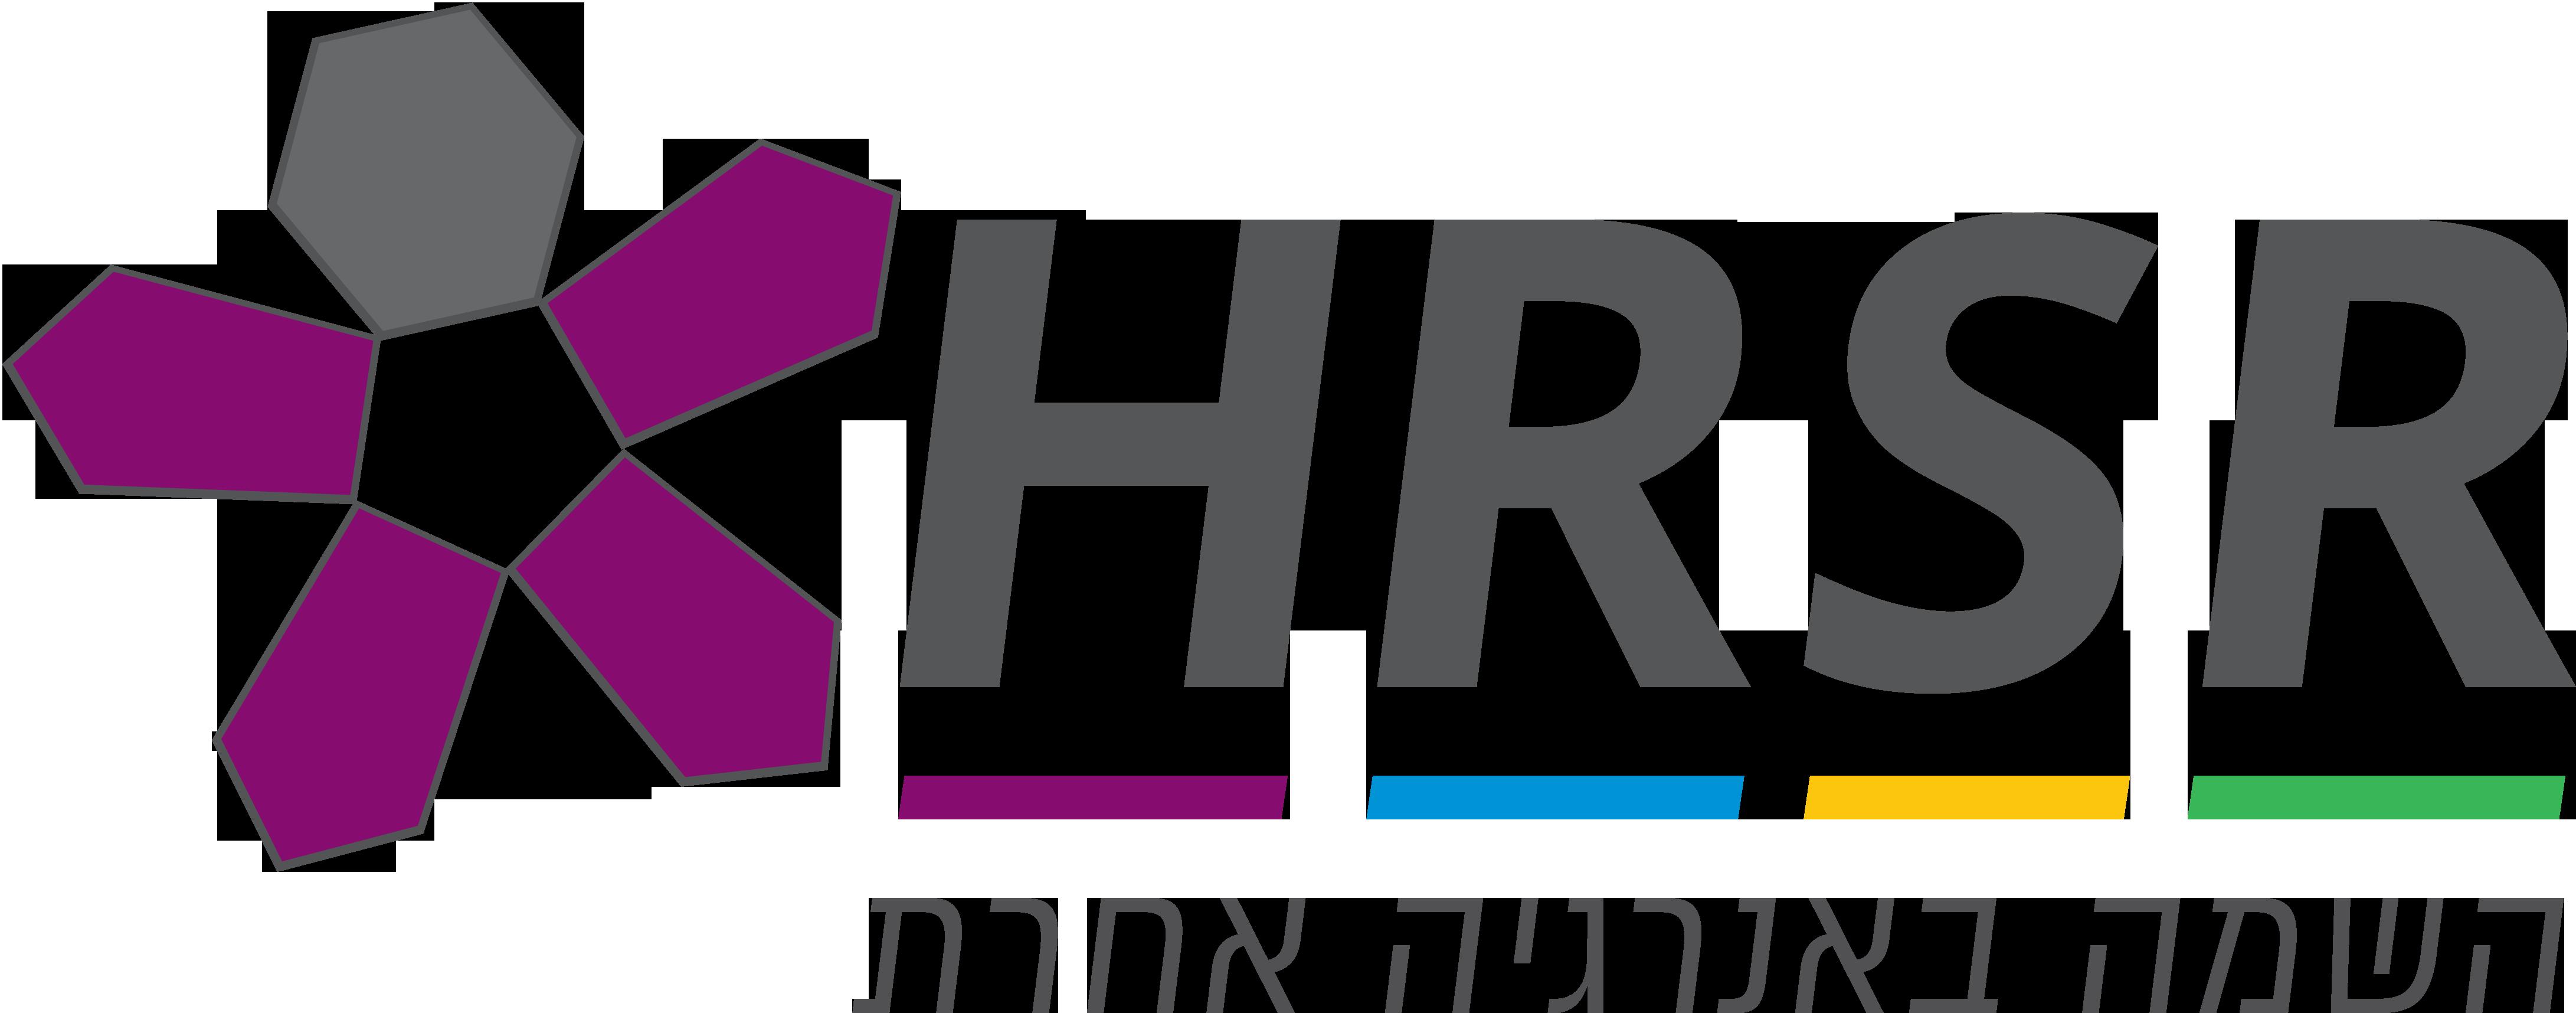 HRSR - השמה באנרגיה אחרת